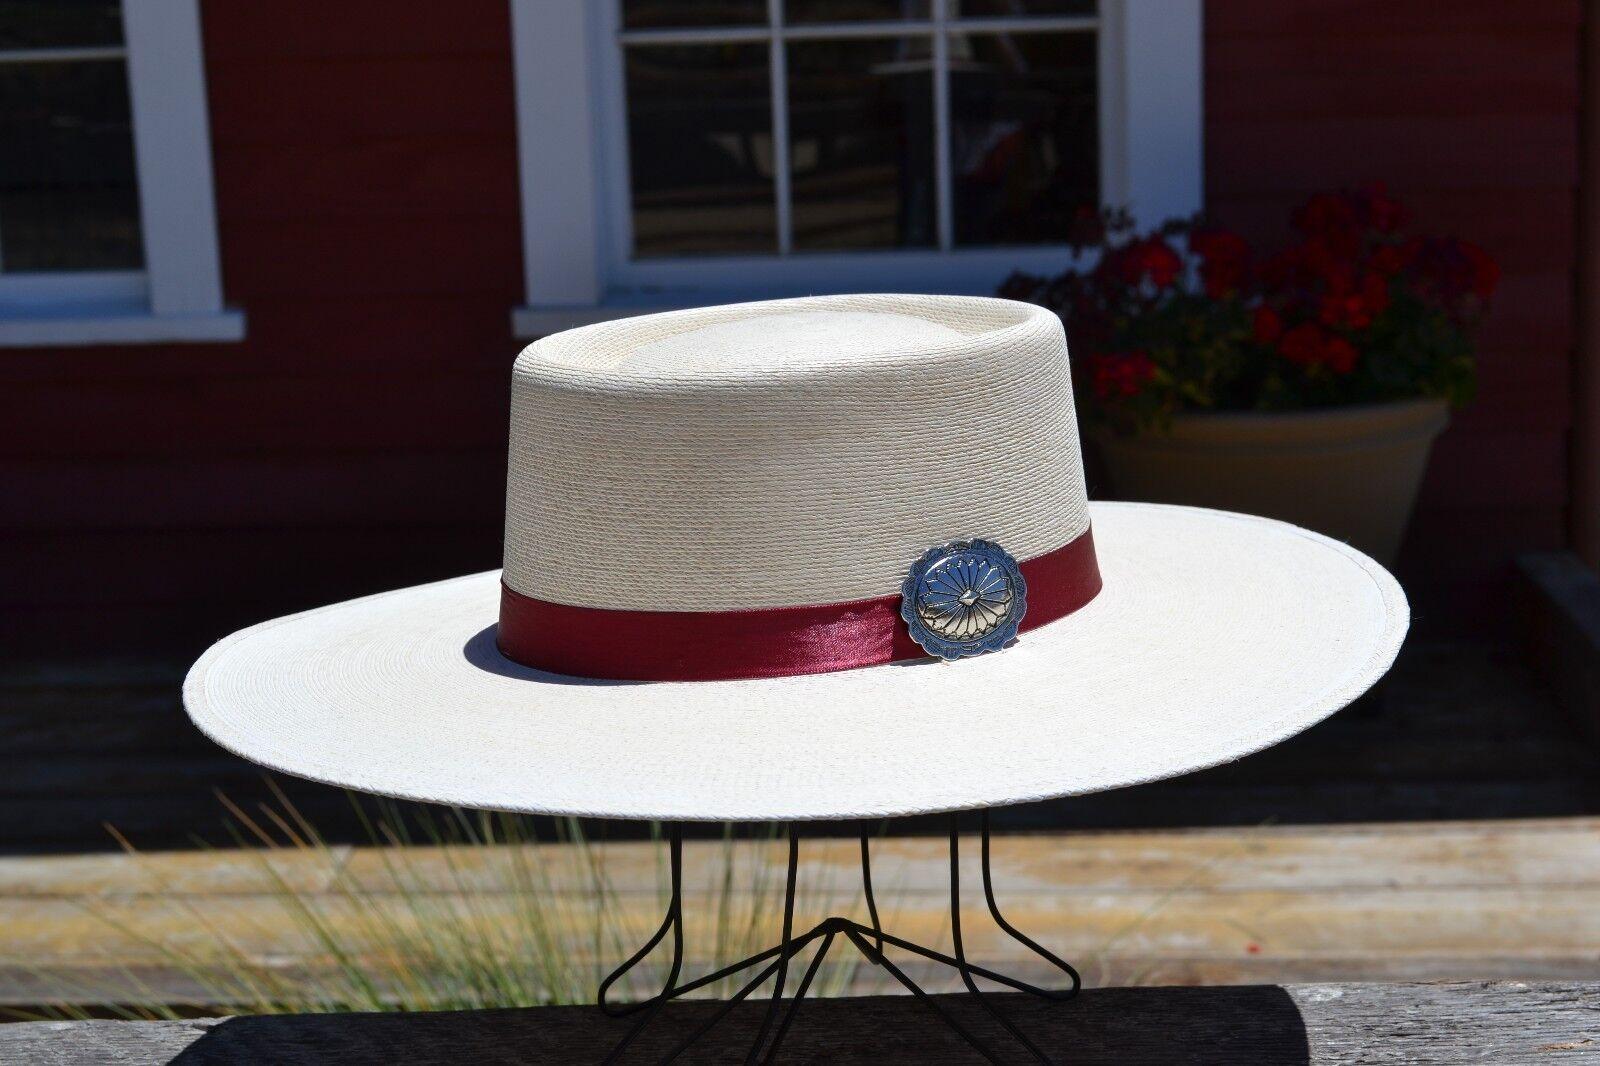 Atwood Hat Company - Rio Concho Nevada 15X Palm Vaquero Cowboy Hat - 4  Brim